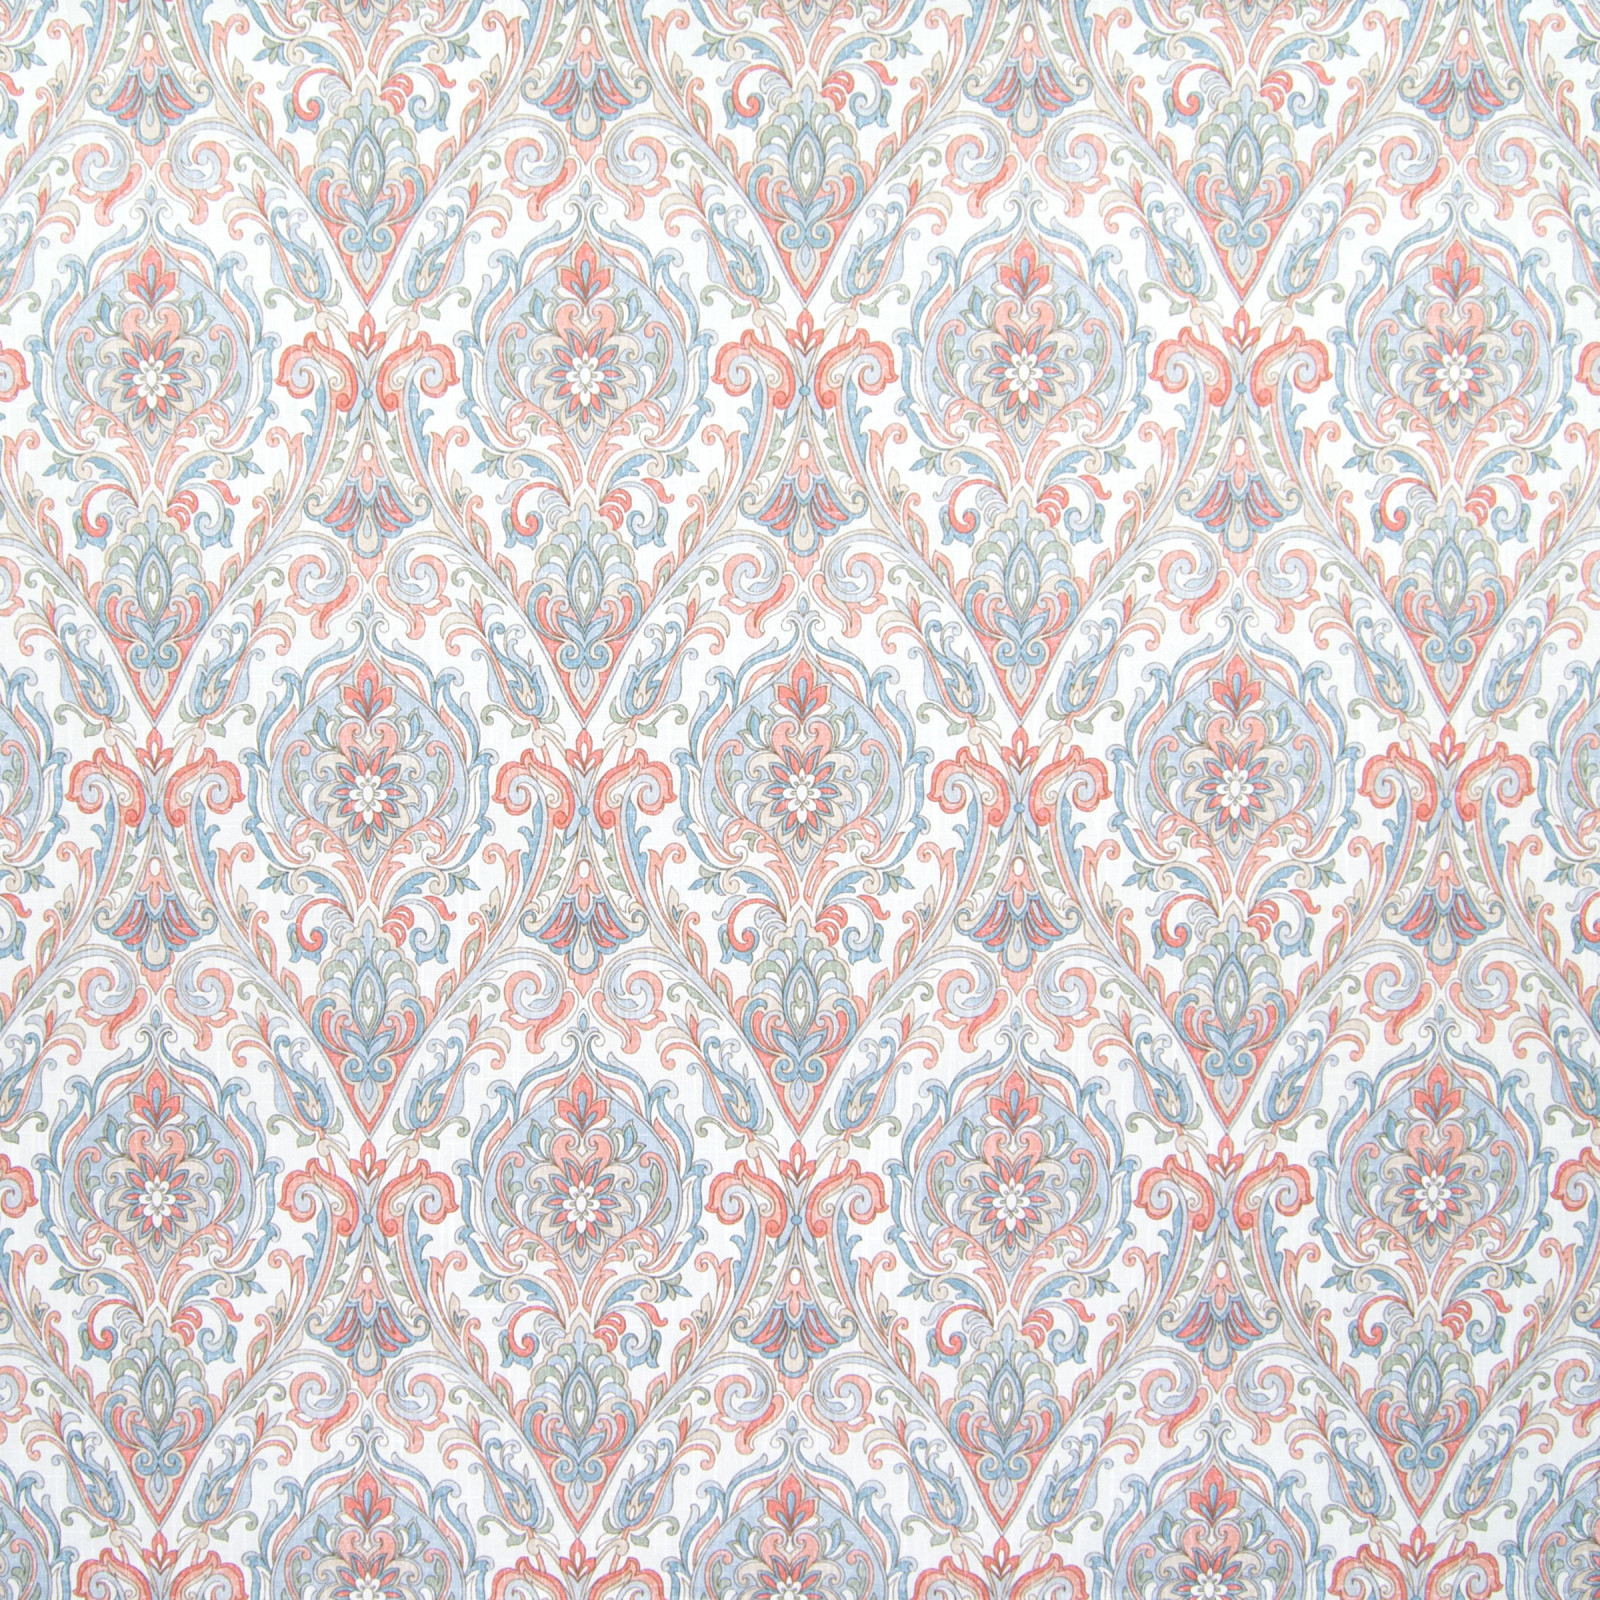 B6540 Cameo Fabric D69 D71 MEDIUM SCALE MEDALLION PRINT BLUE